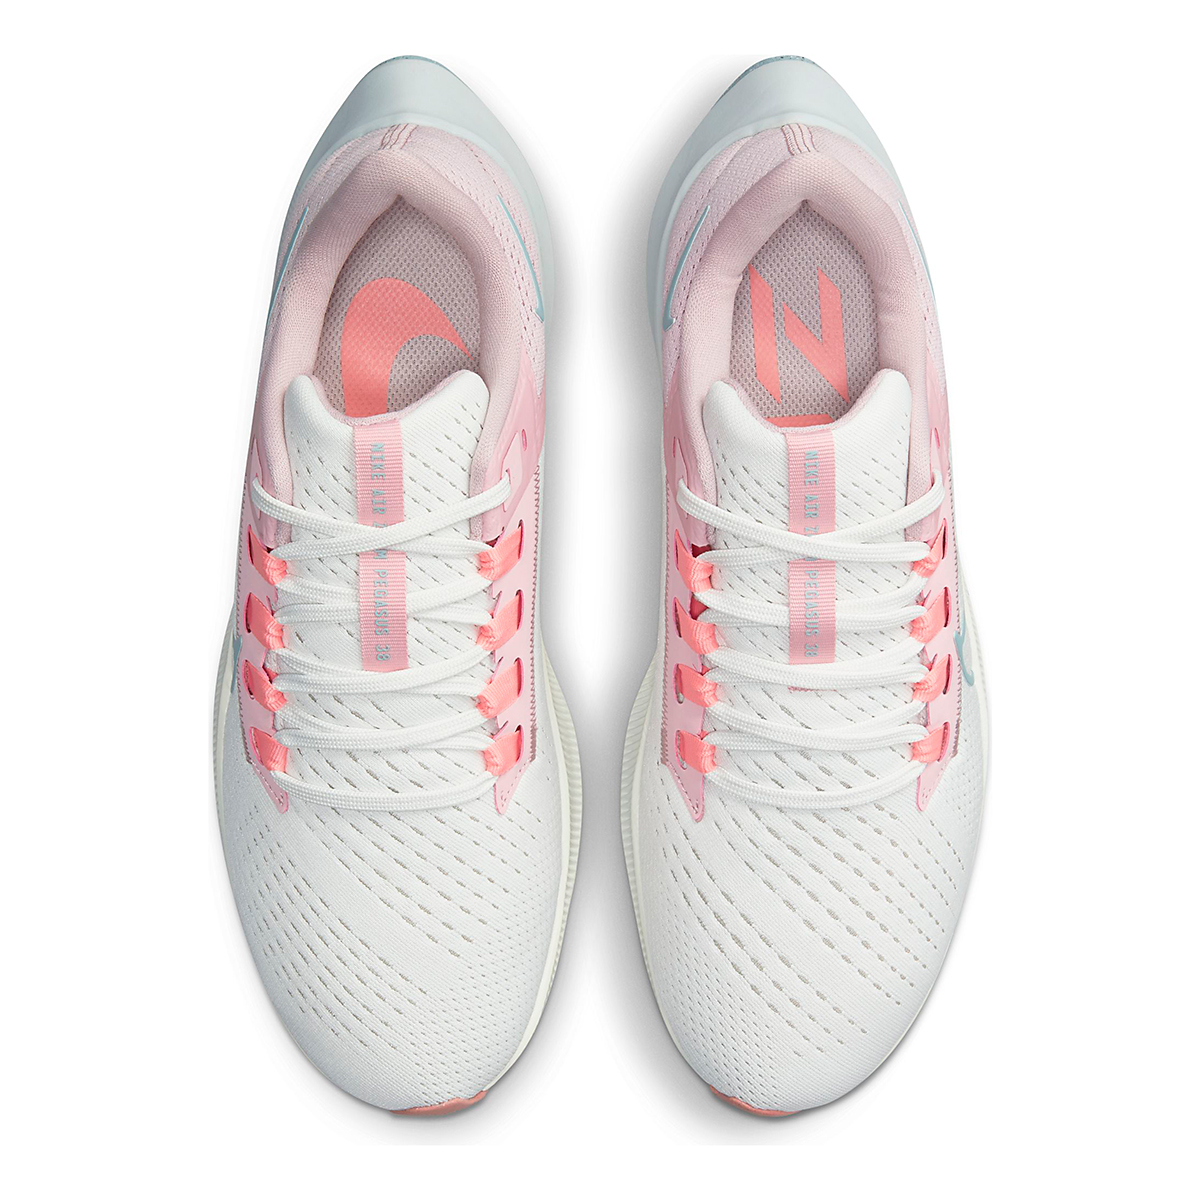 Women's Nike Air Zoom Pegasus 38 Running Shoe - Color: Sail/Ocean Cube/Pink Glaze/Crimson Bliss - Size: 5 - Width: Regular, Sail/Ocean Cube/Pink Glaze/Crimson Bliss, large, image 6